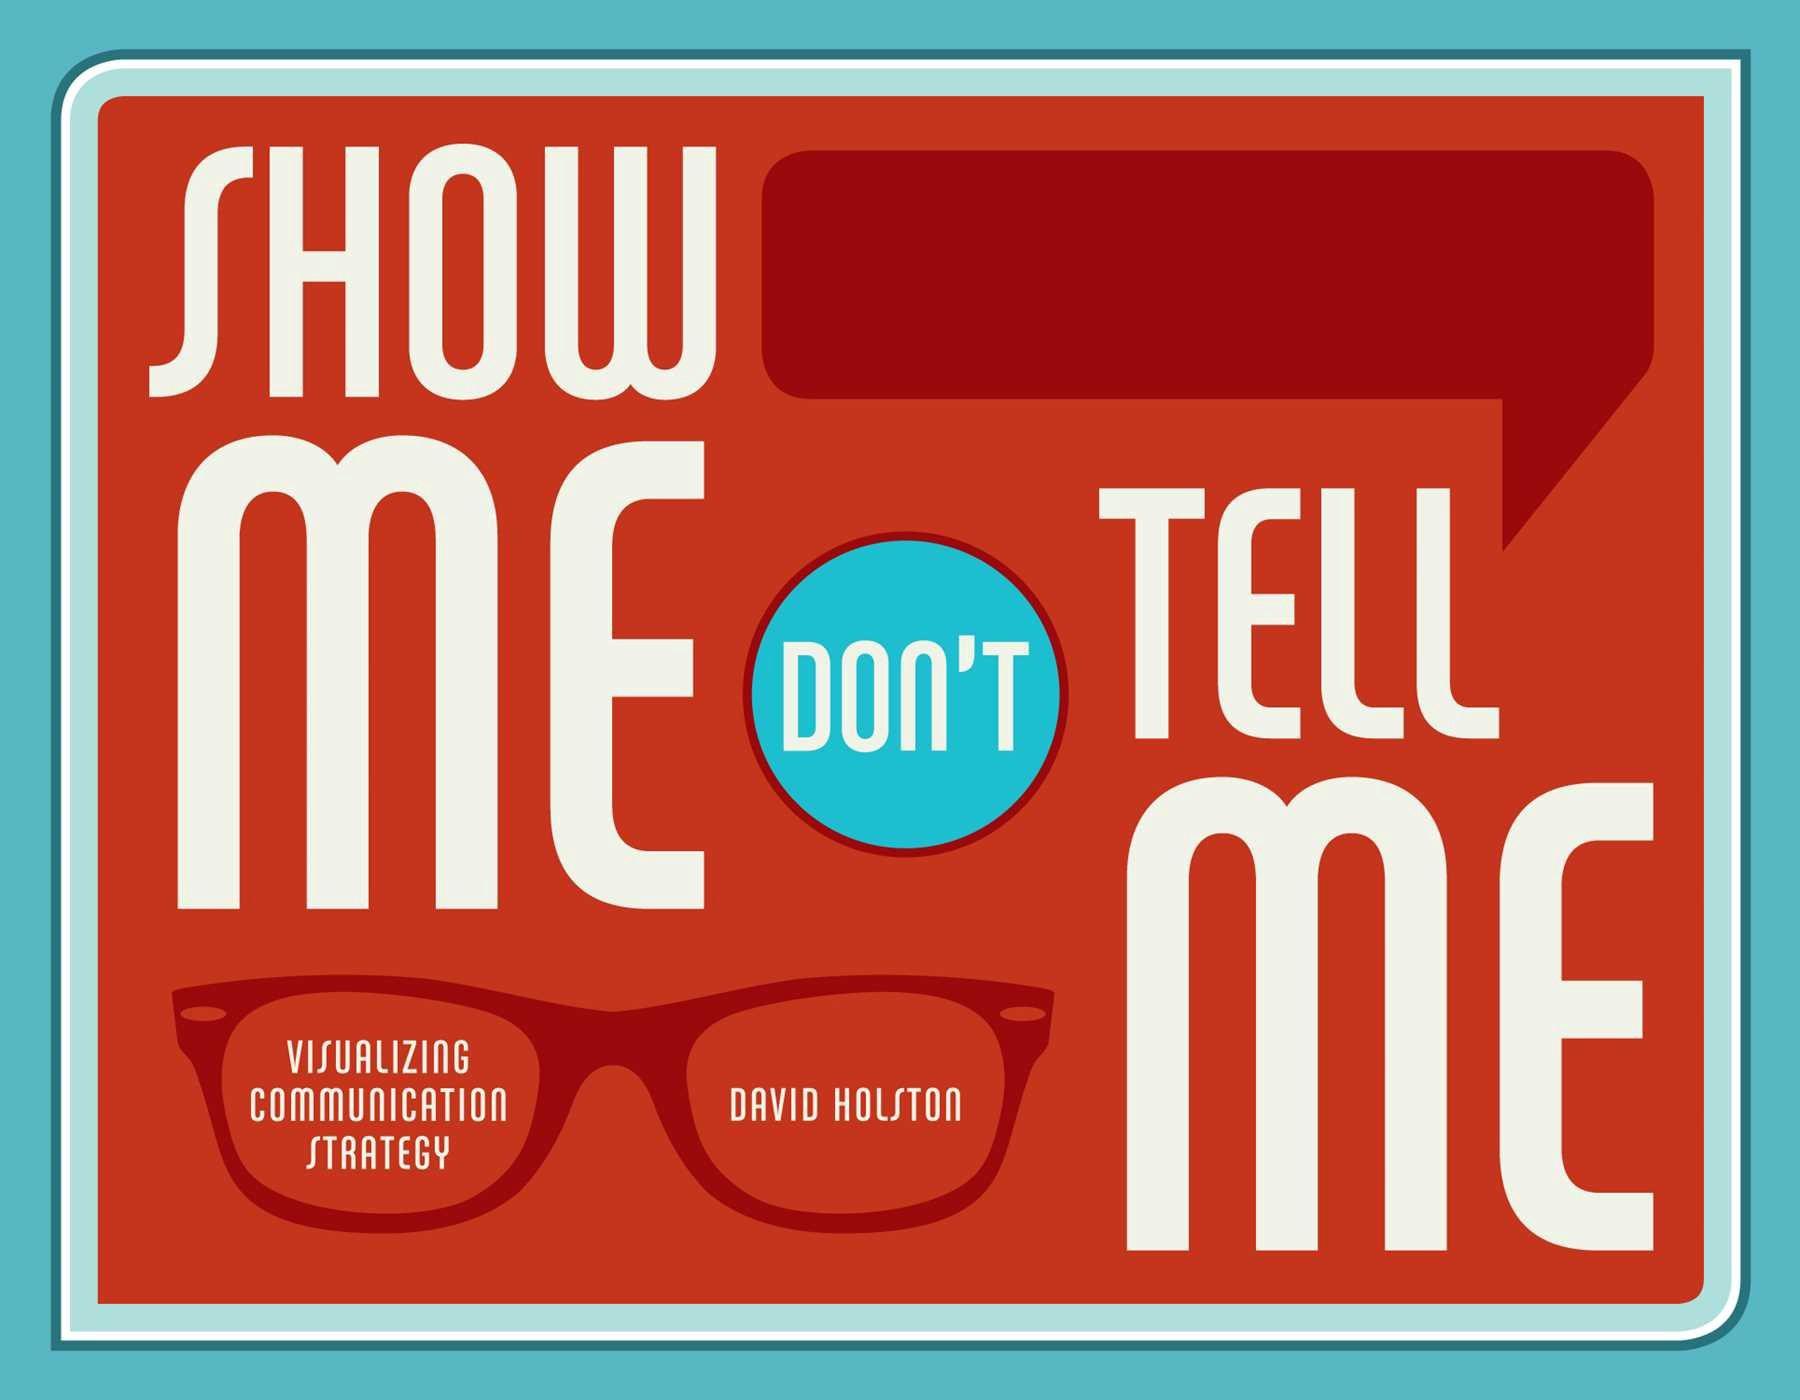 Dave Holston's book, Show Me, Don't TellMe